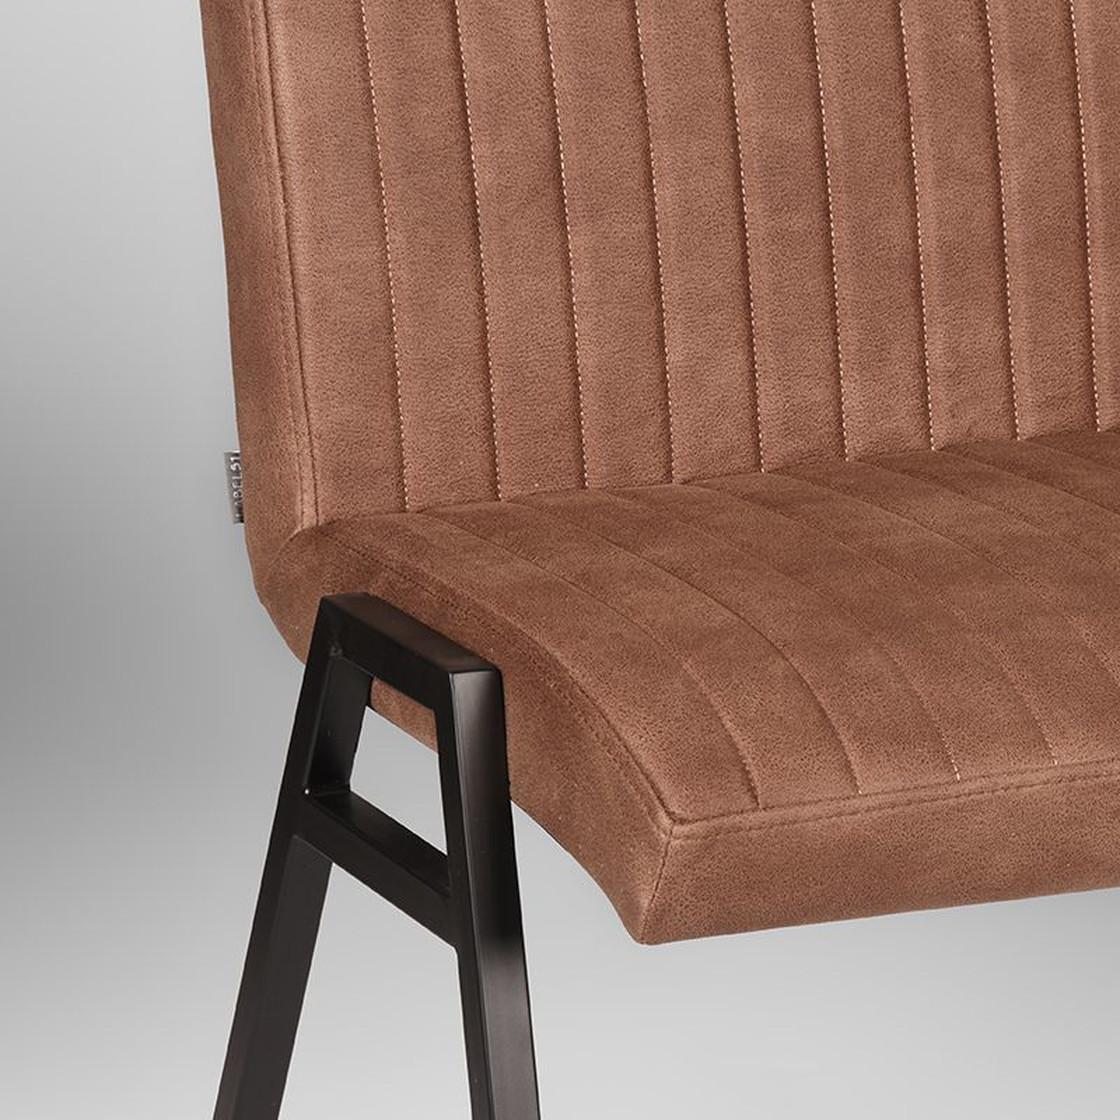 Full Size of Esszimmer Sofa Leder Vintage Grau Landhausstil Modern Sofabank Couch Ikea 3 Sitzer Samt Esszimmersofa Matz B 145 Cm T 62 H 86 Massivholzbetten We Recamiere Sofa Esszimmer Sofa